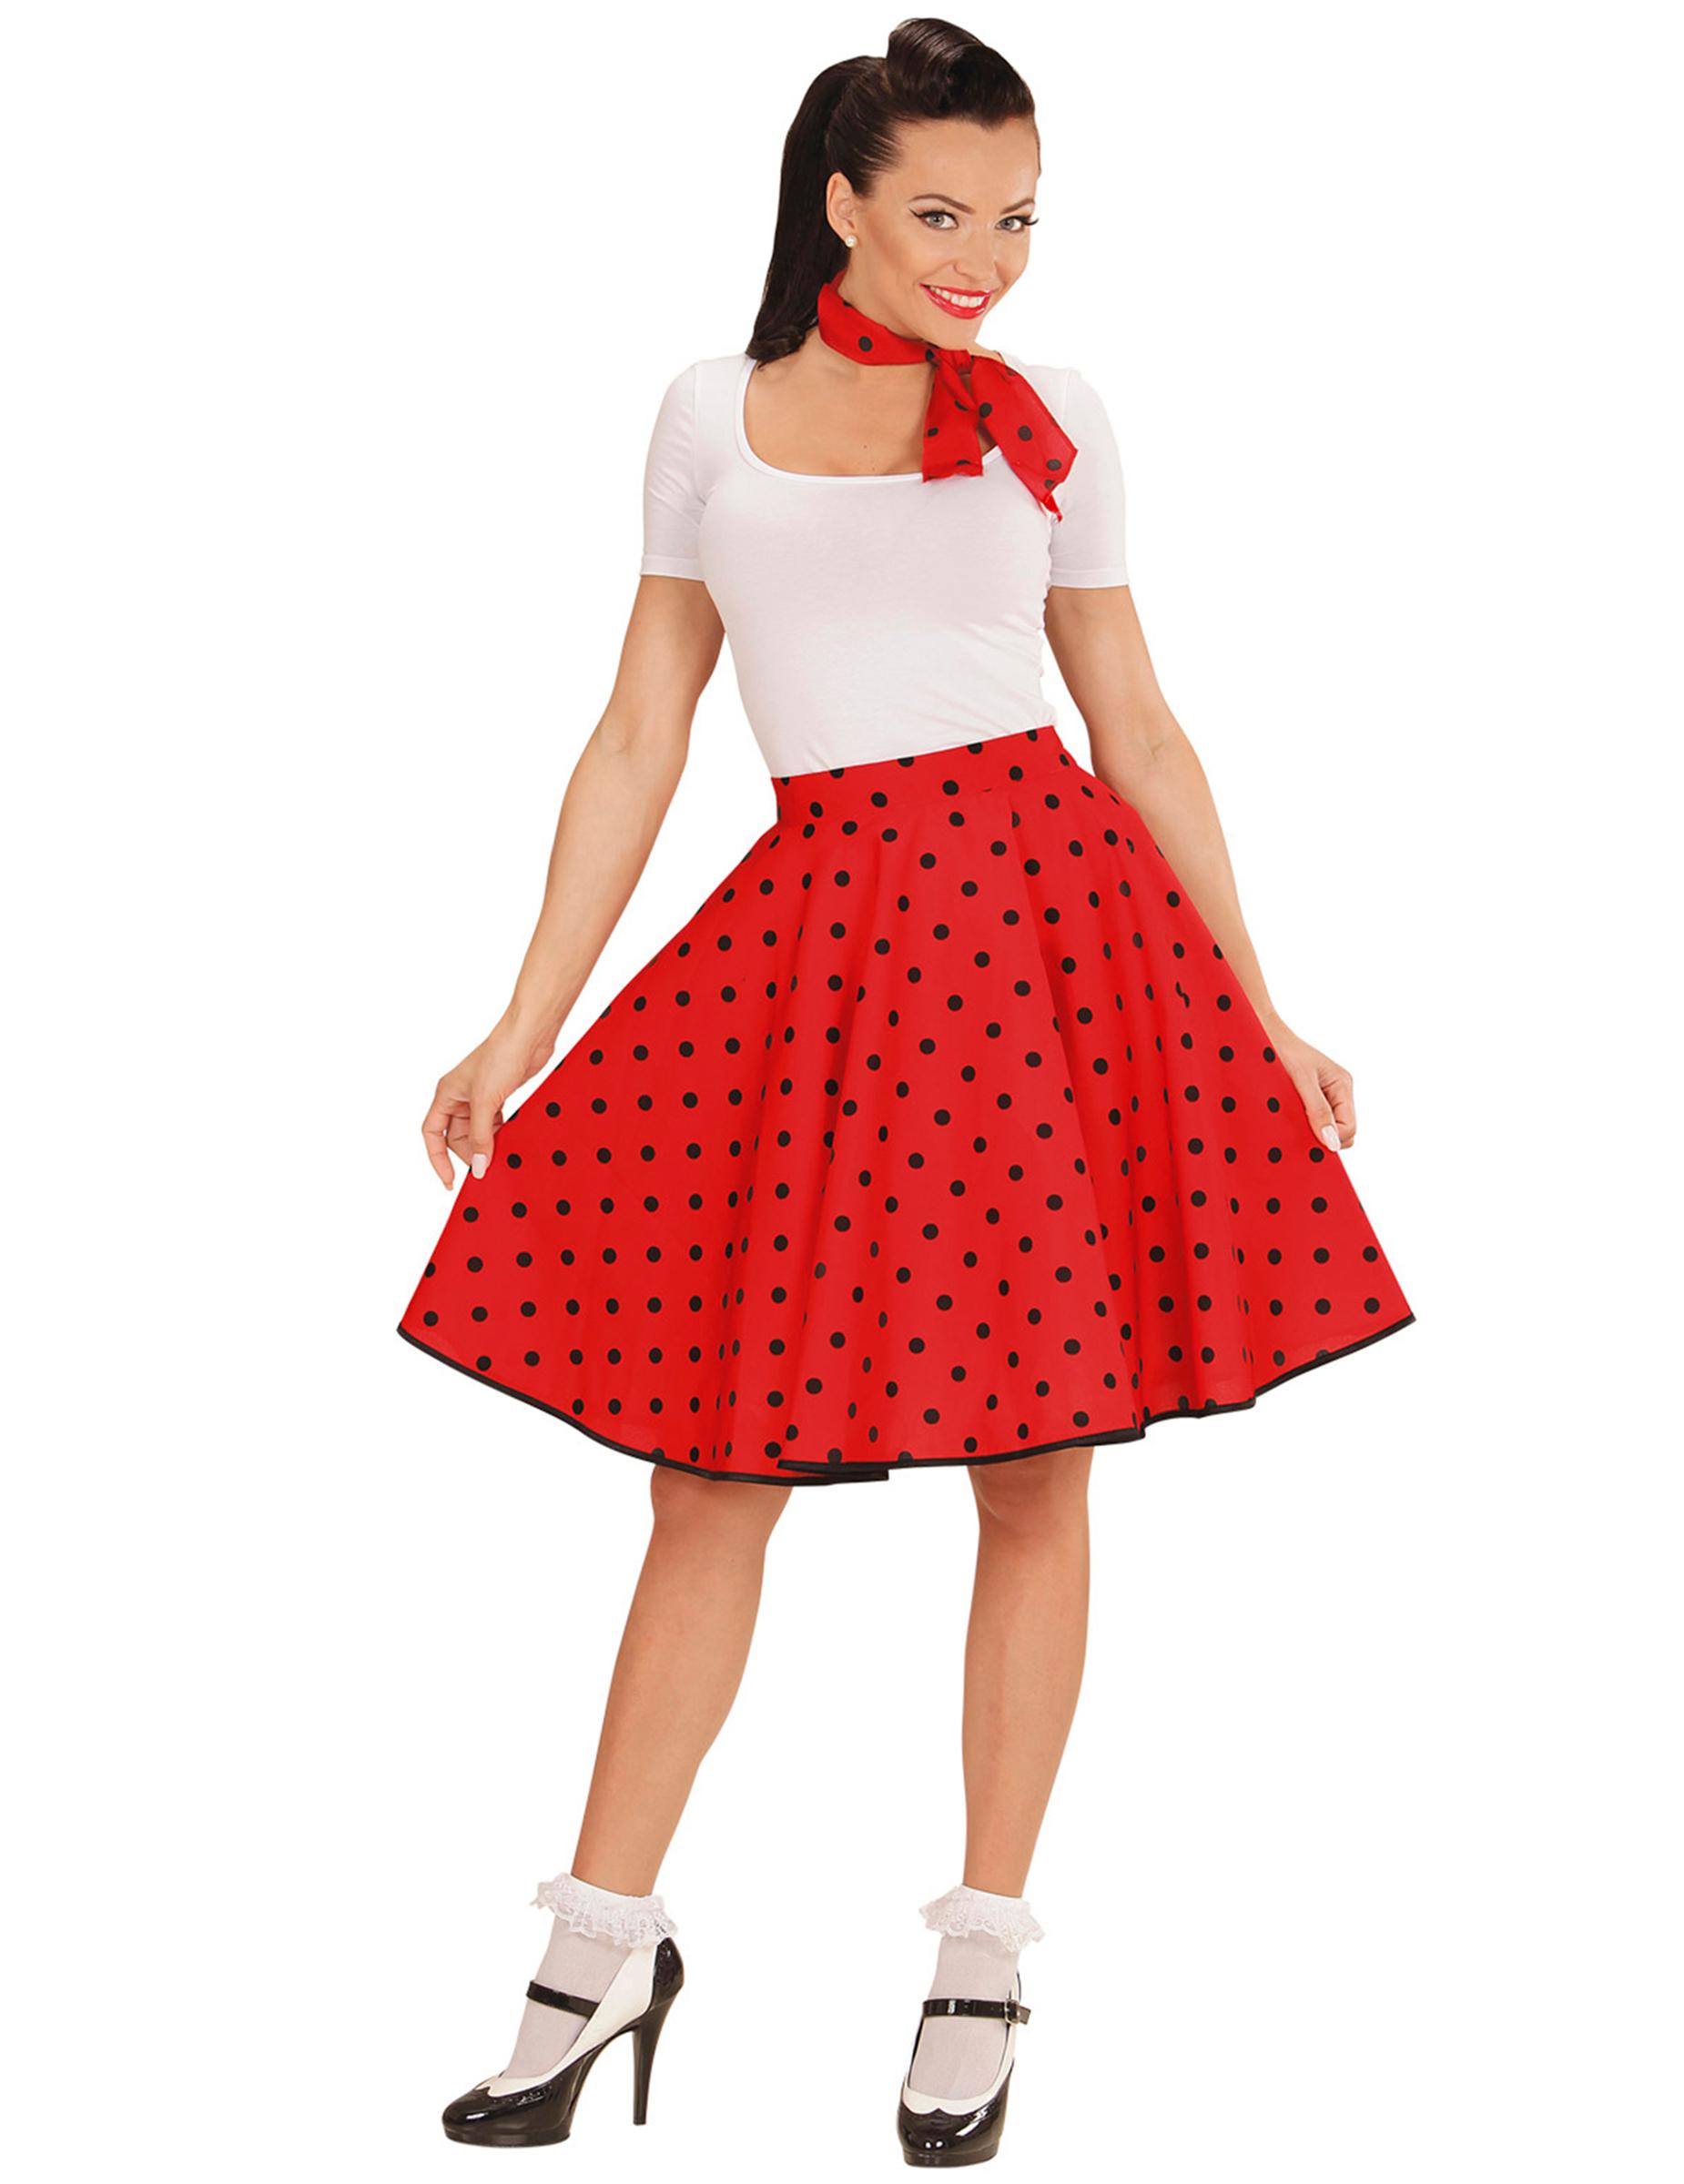 low priced 671b9 8926d Röd prickig 50-tals kjol och scarf vuxen